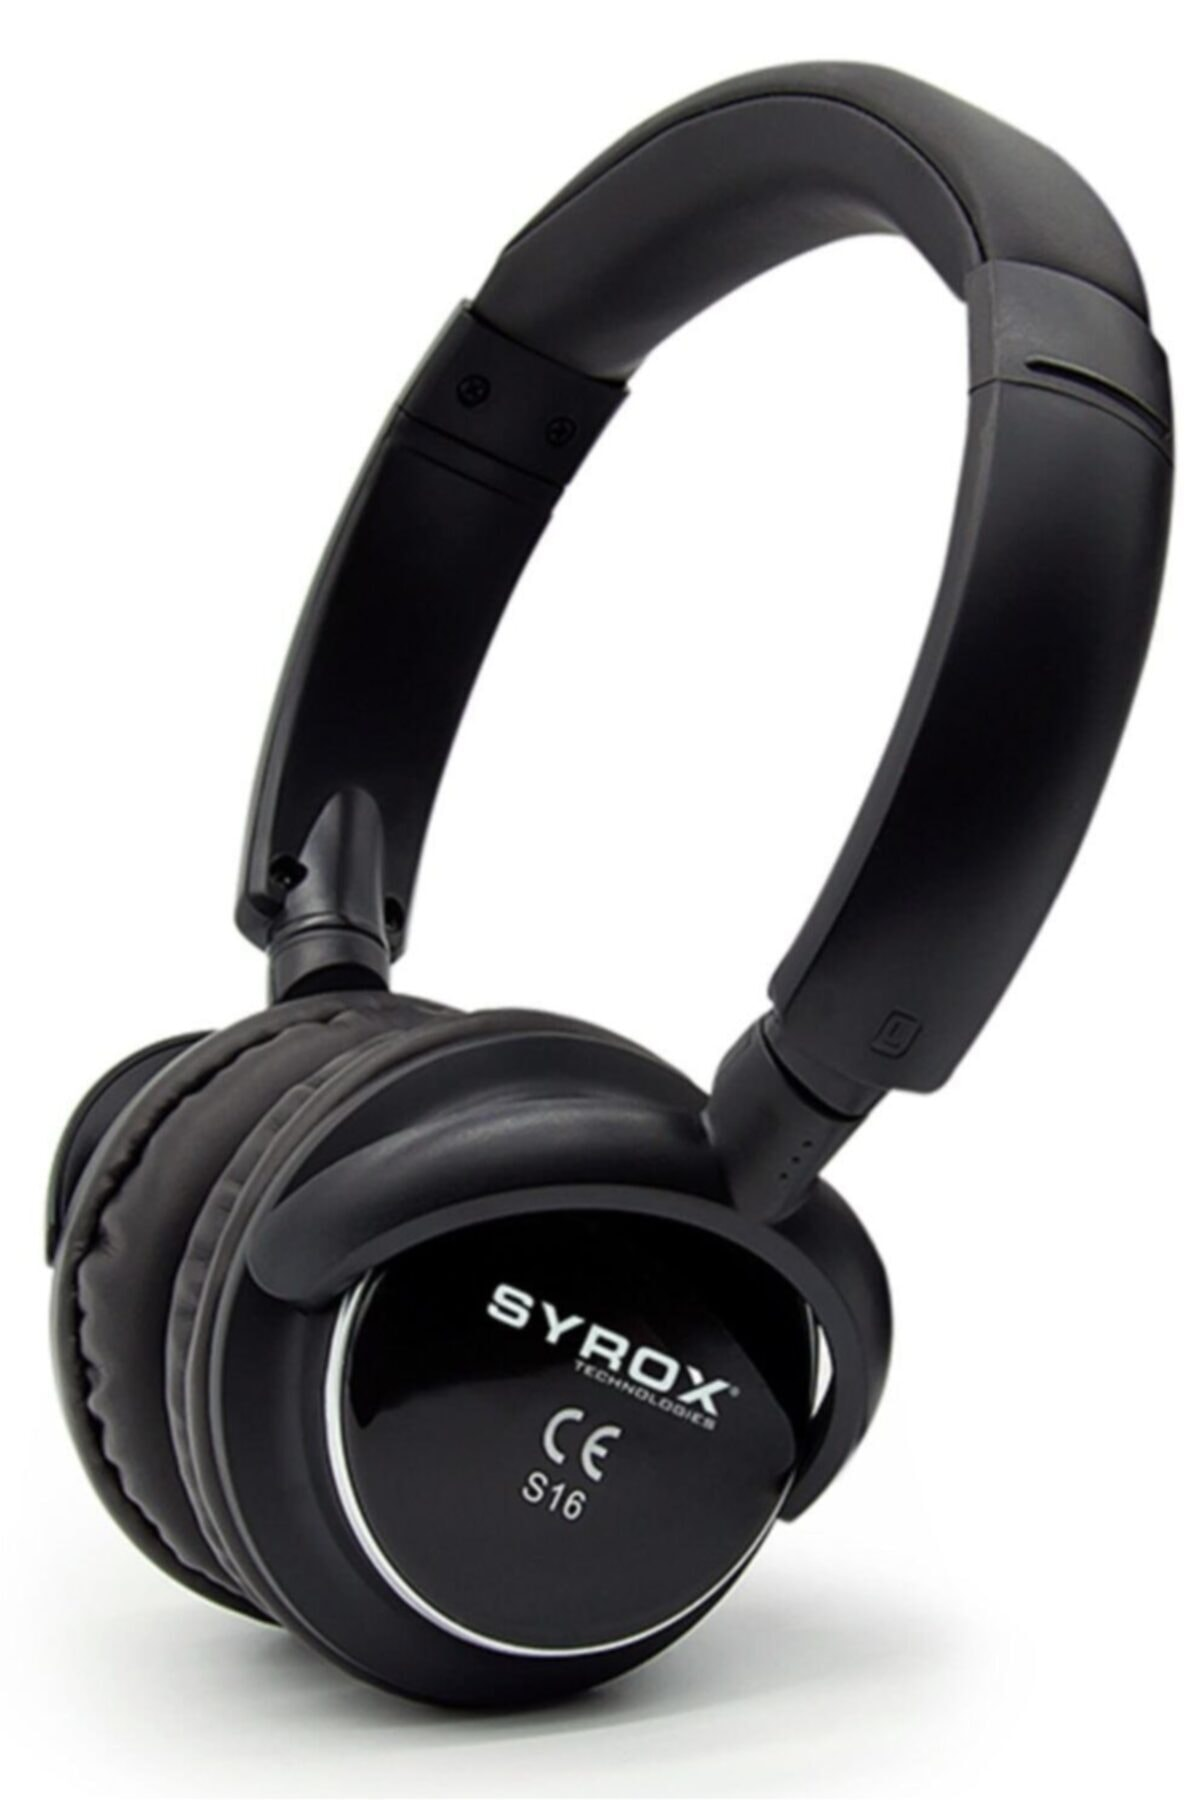 Siyah J-84 As16 16 Bluetooth 4 Fonksiyonlu Kulak Üstü Kulaklık S16